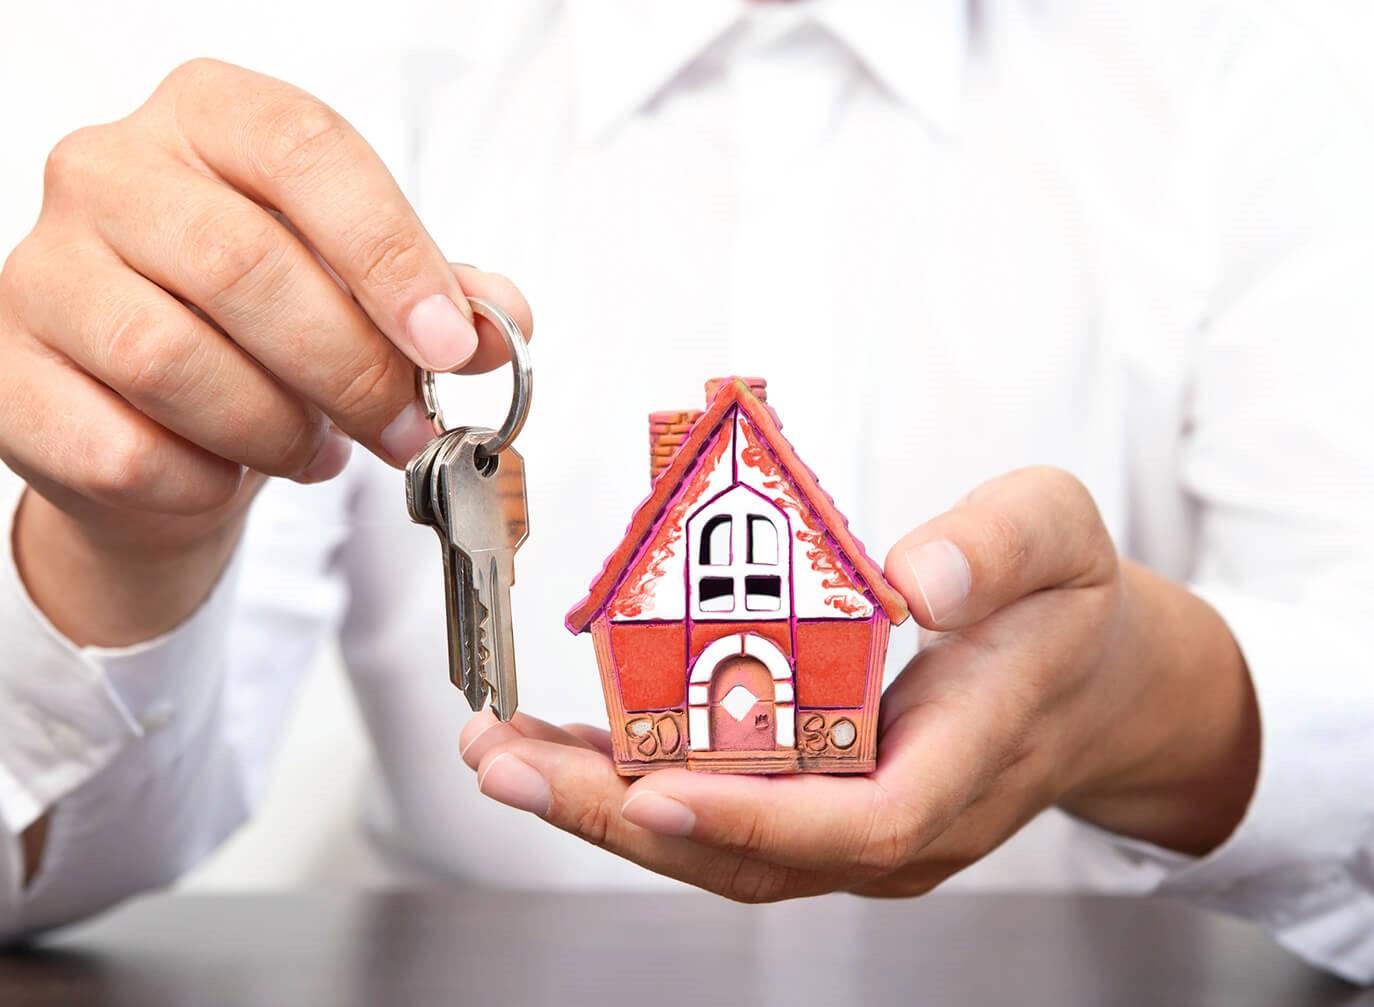 7 Benefits of Property Management Software for Realtors